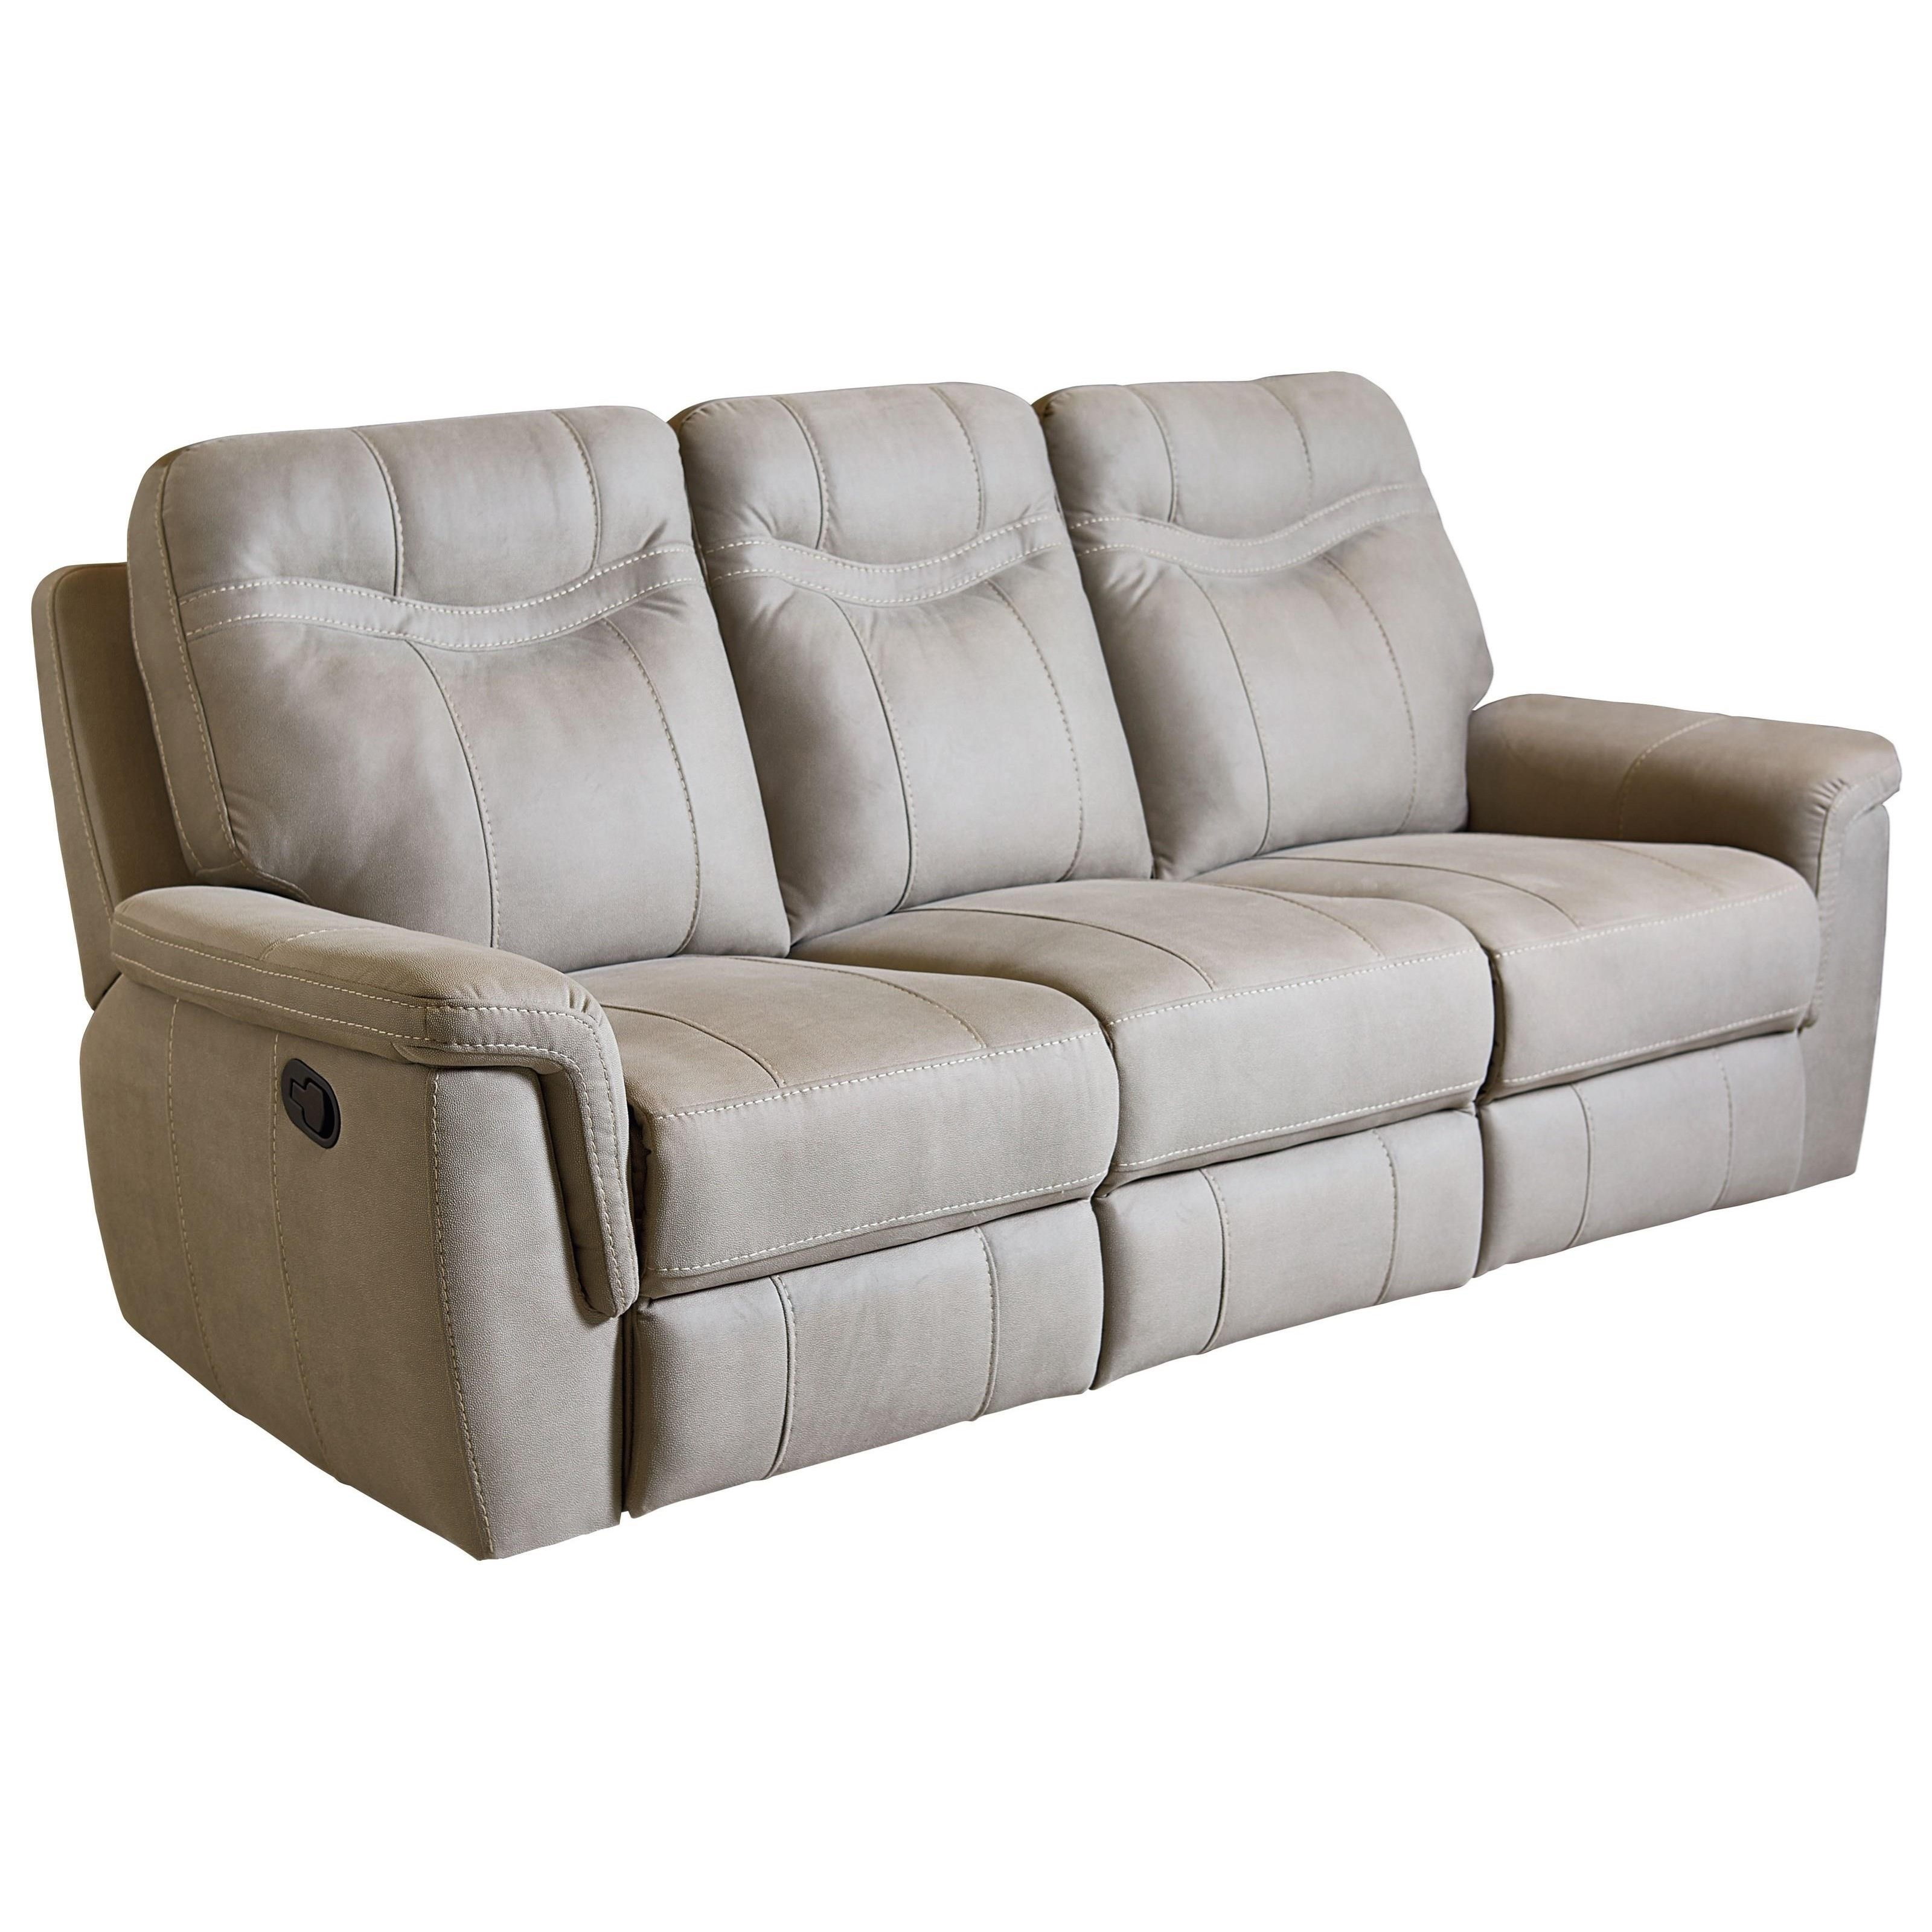 Standard Furniture Boardwalk 4017391 Contemporary